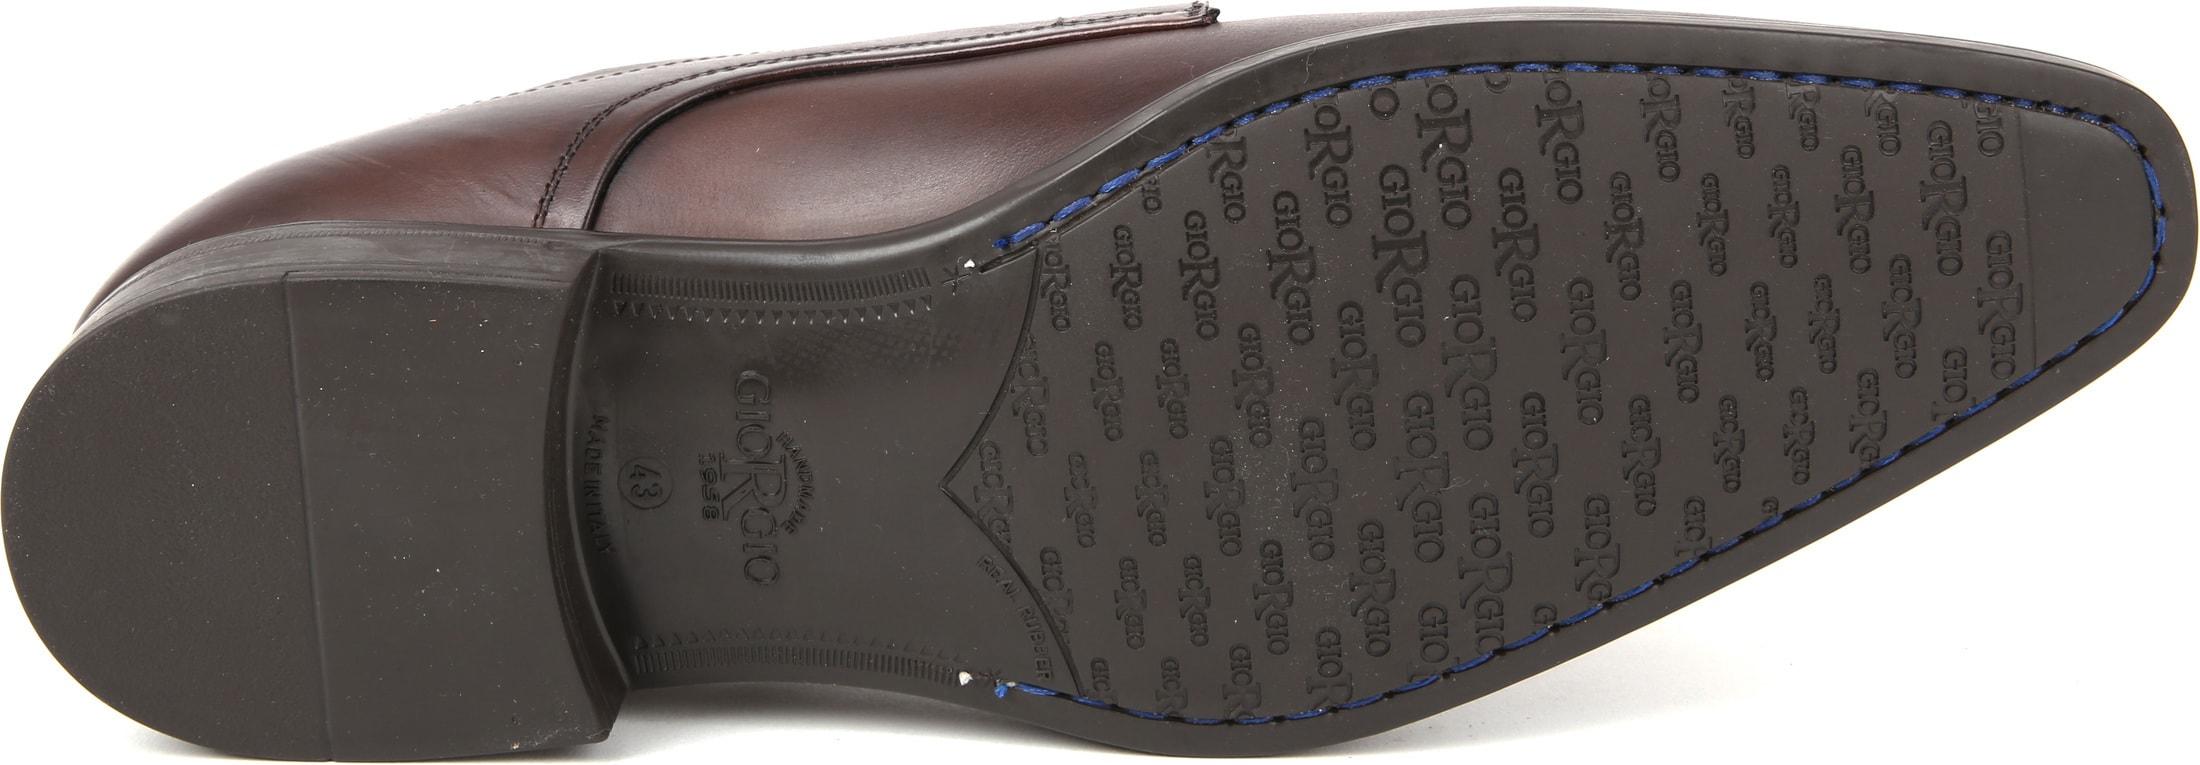 Giorgio Scandicci Shoe Deep Brown photo 3